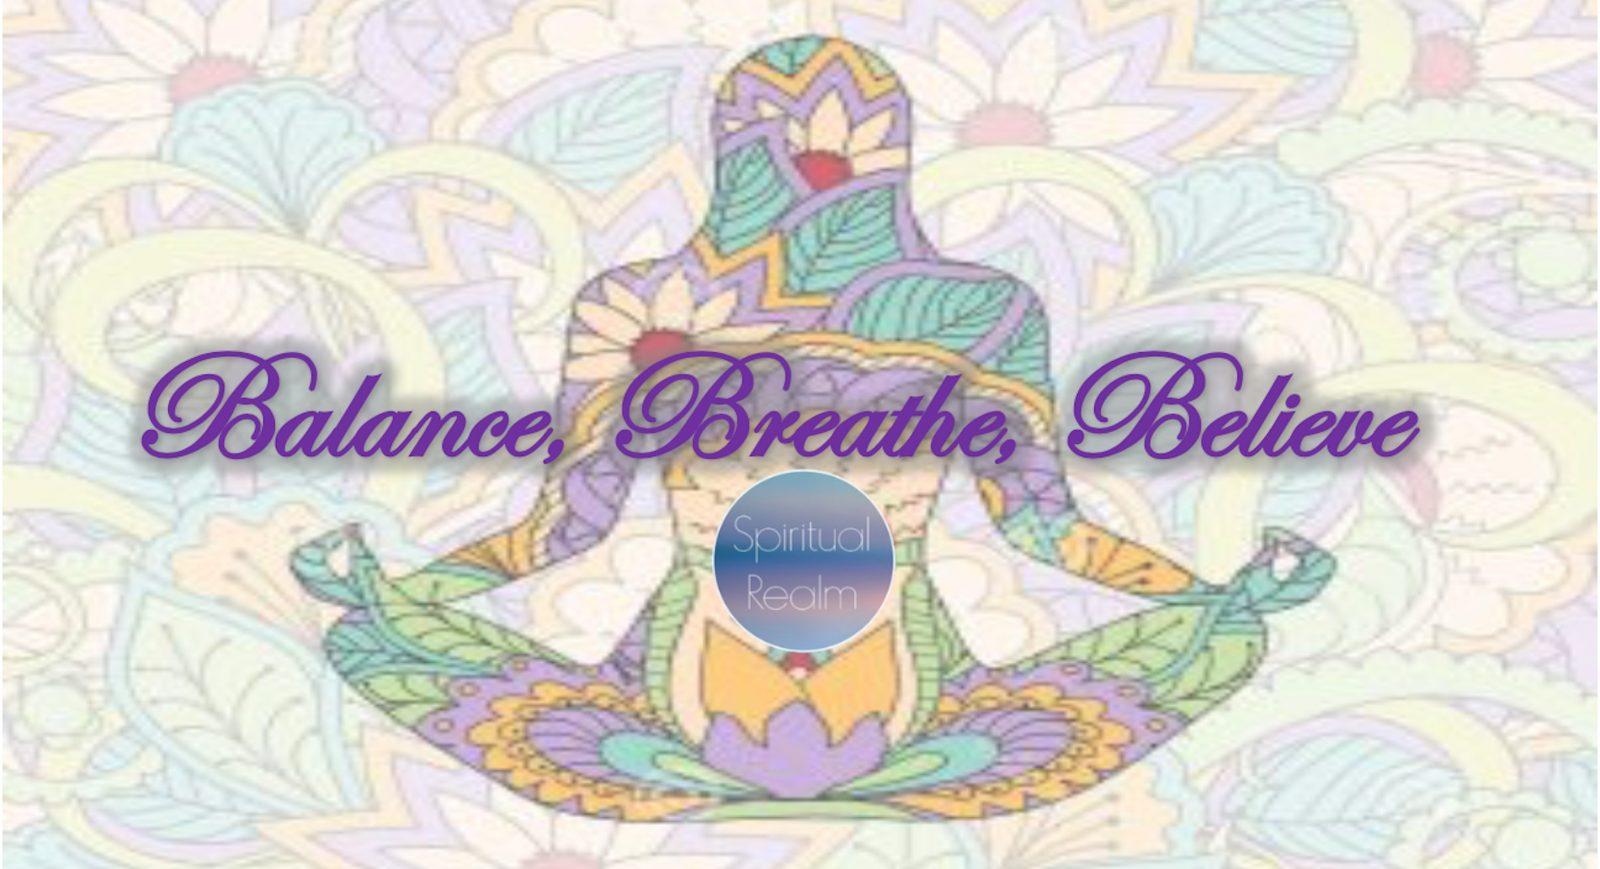 Balance, Breathe, Believe Yoga Workshops